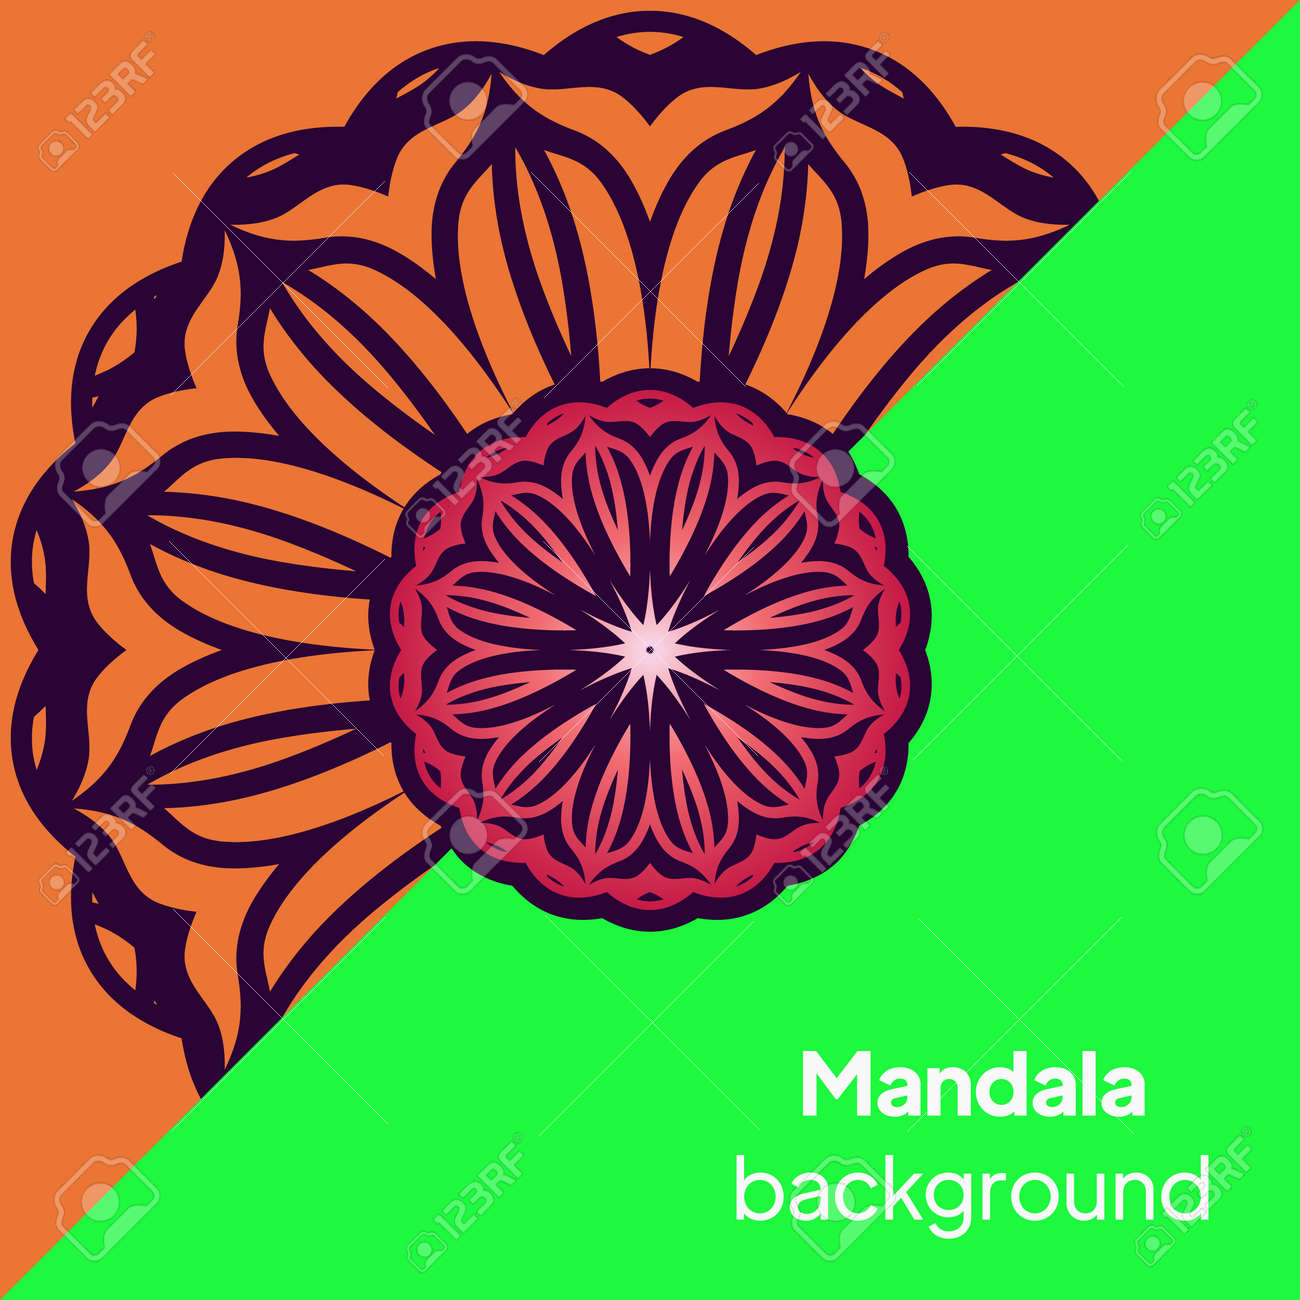 Vector Beautiful Contour Flower Mandala. Vector illustration - 167216189